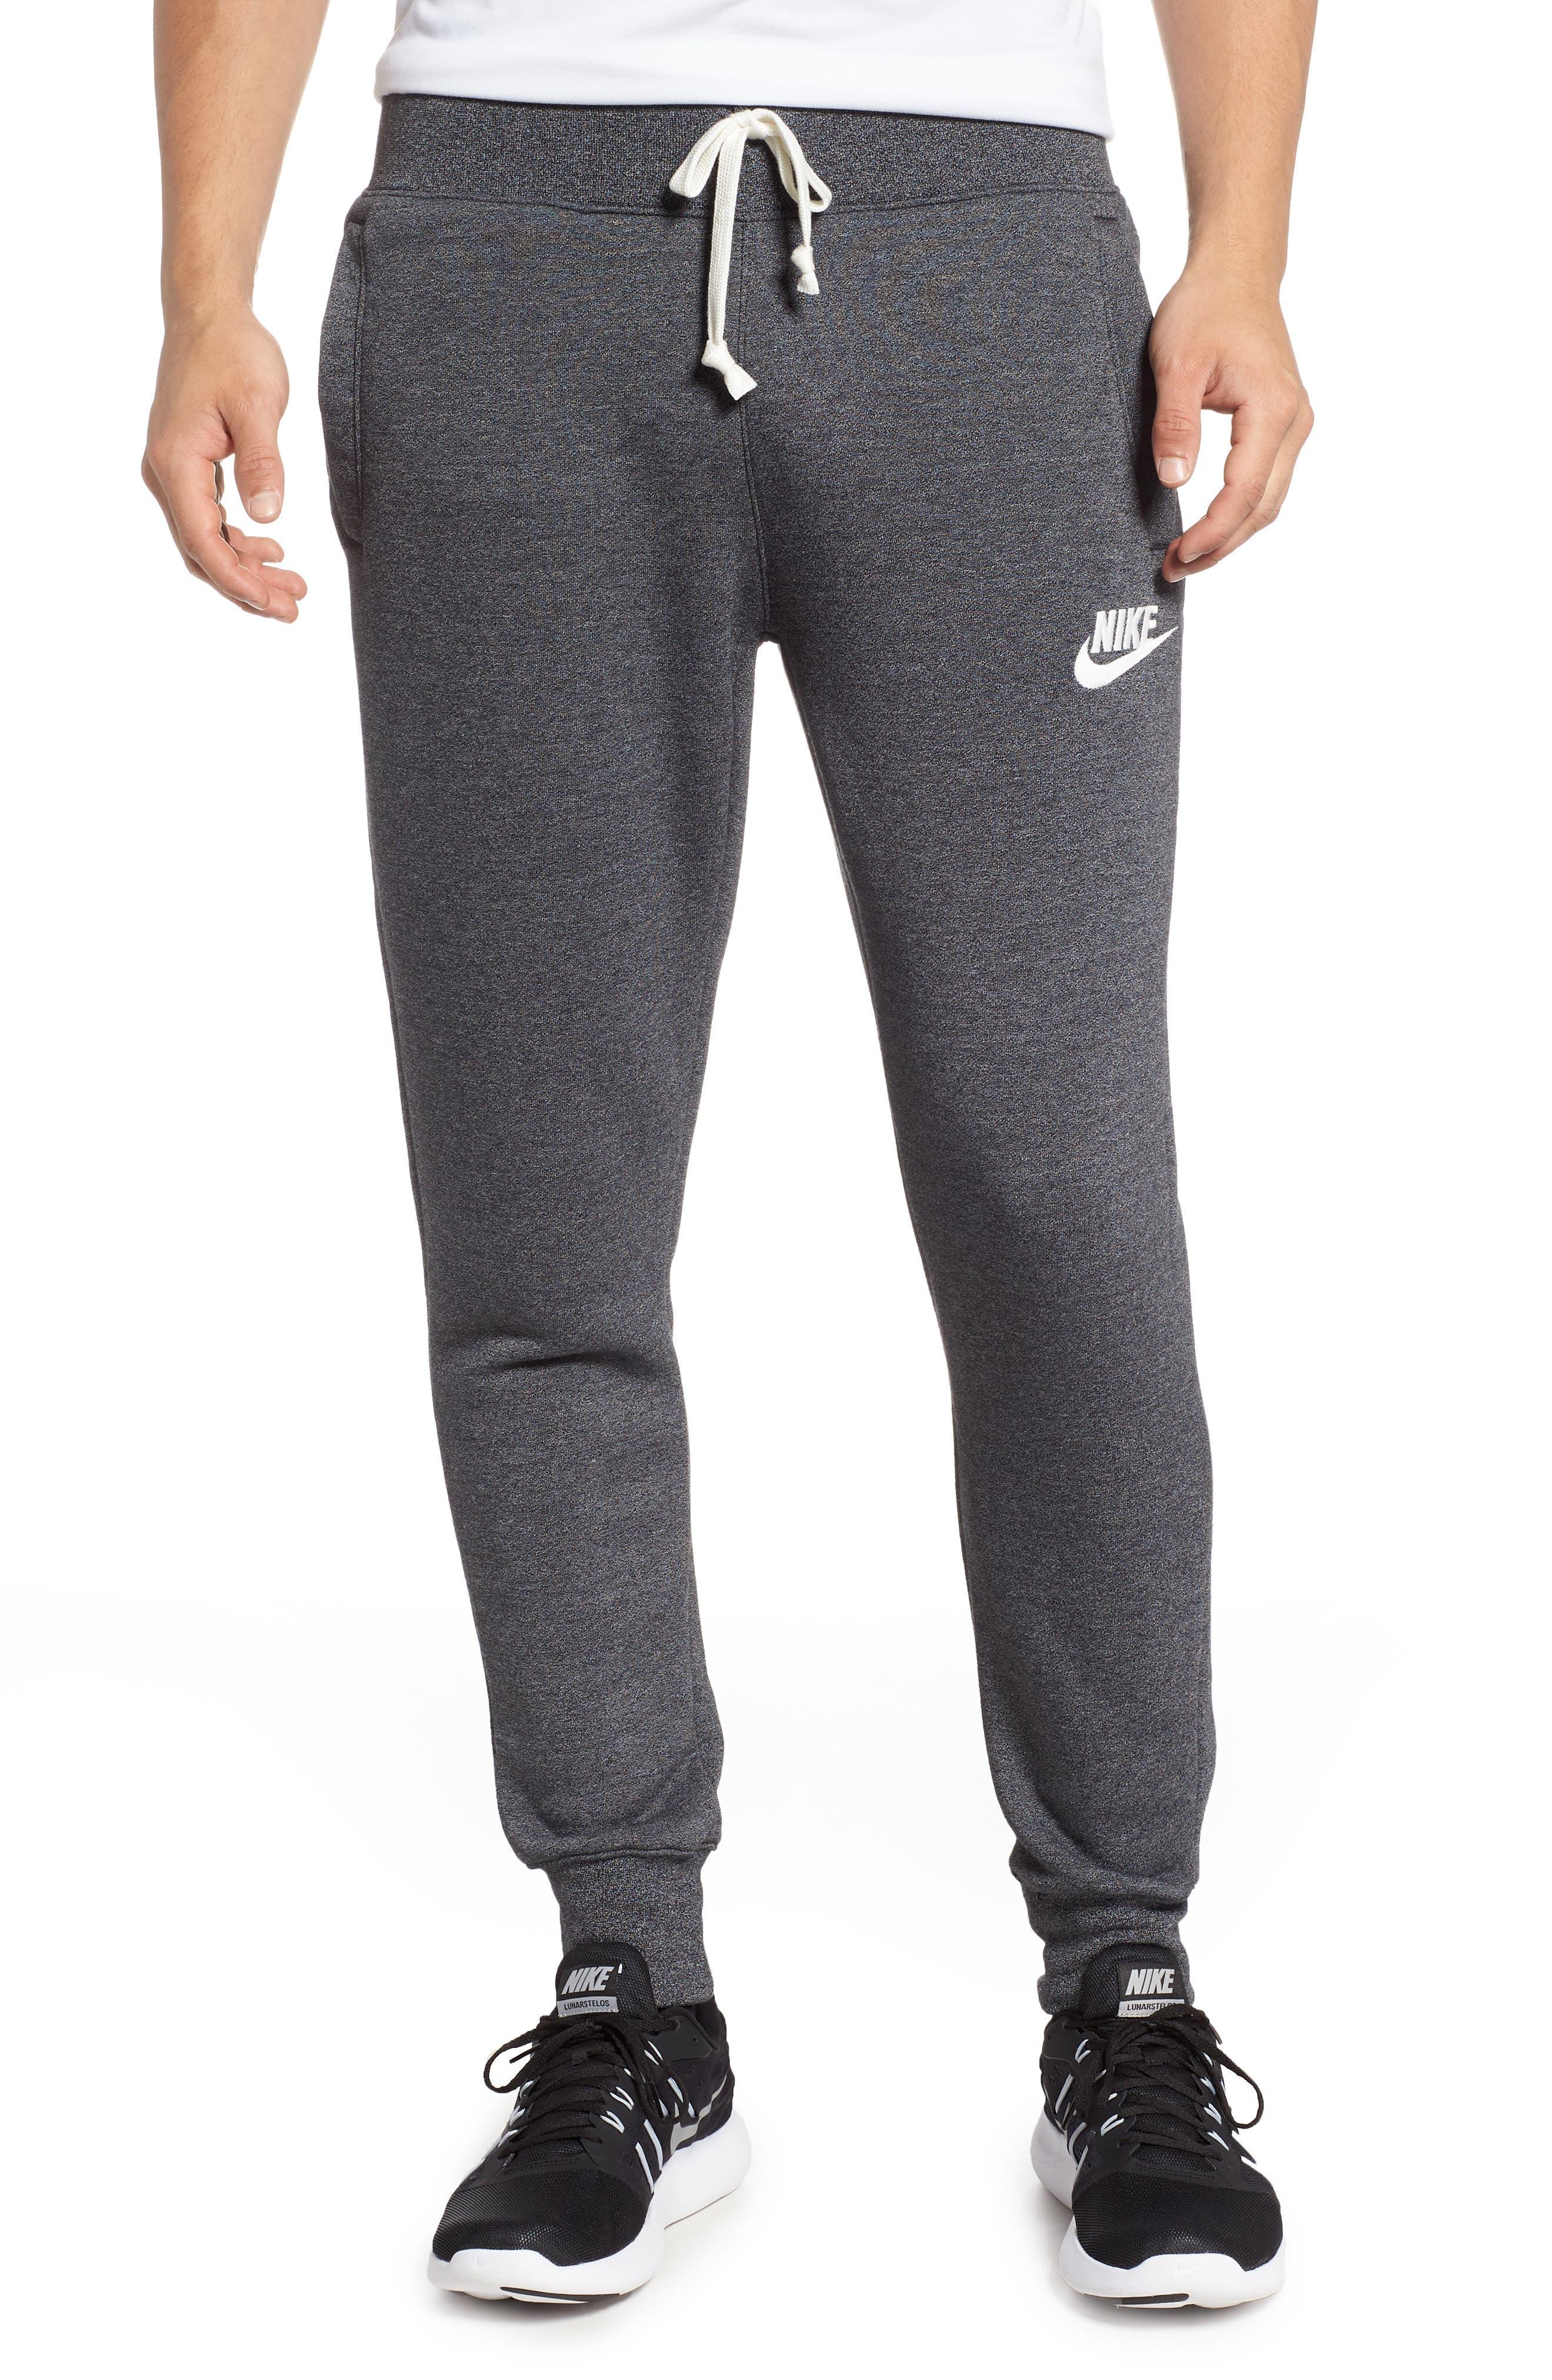 Heritage Jogger Pants,                         Main,                         color, BLACK/ HEATHER/ SAIL